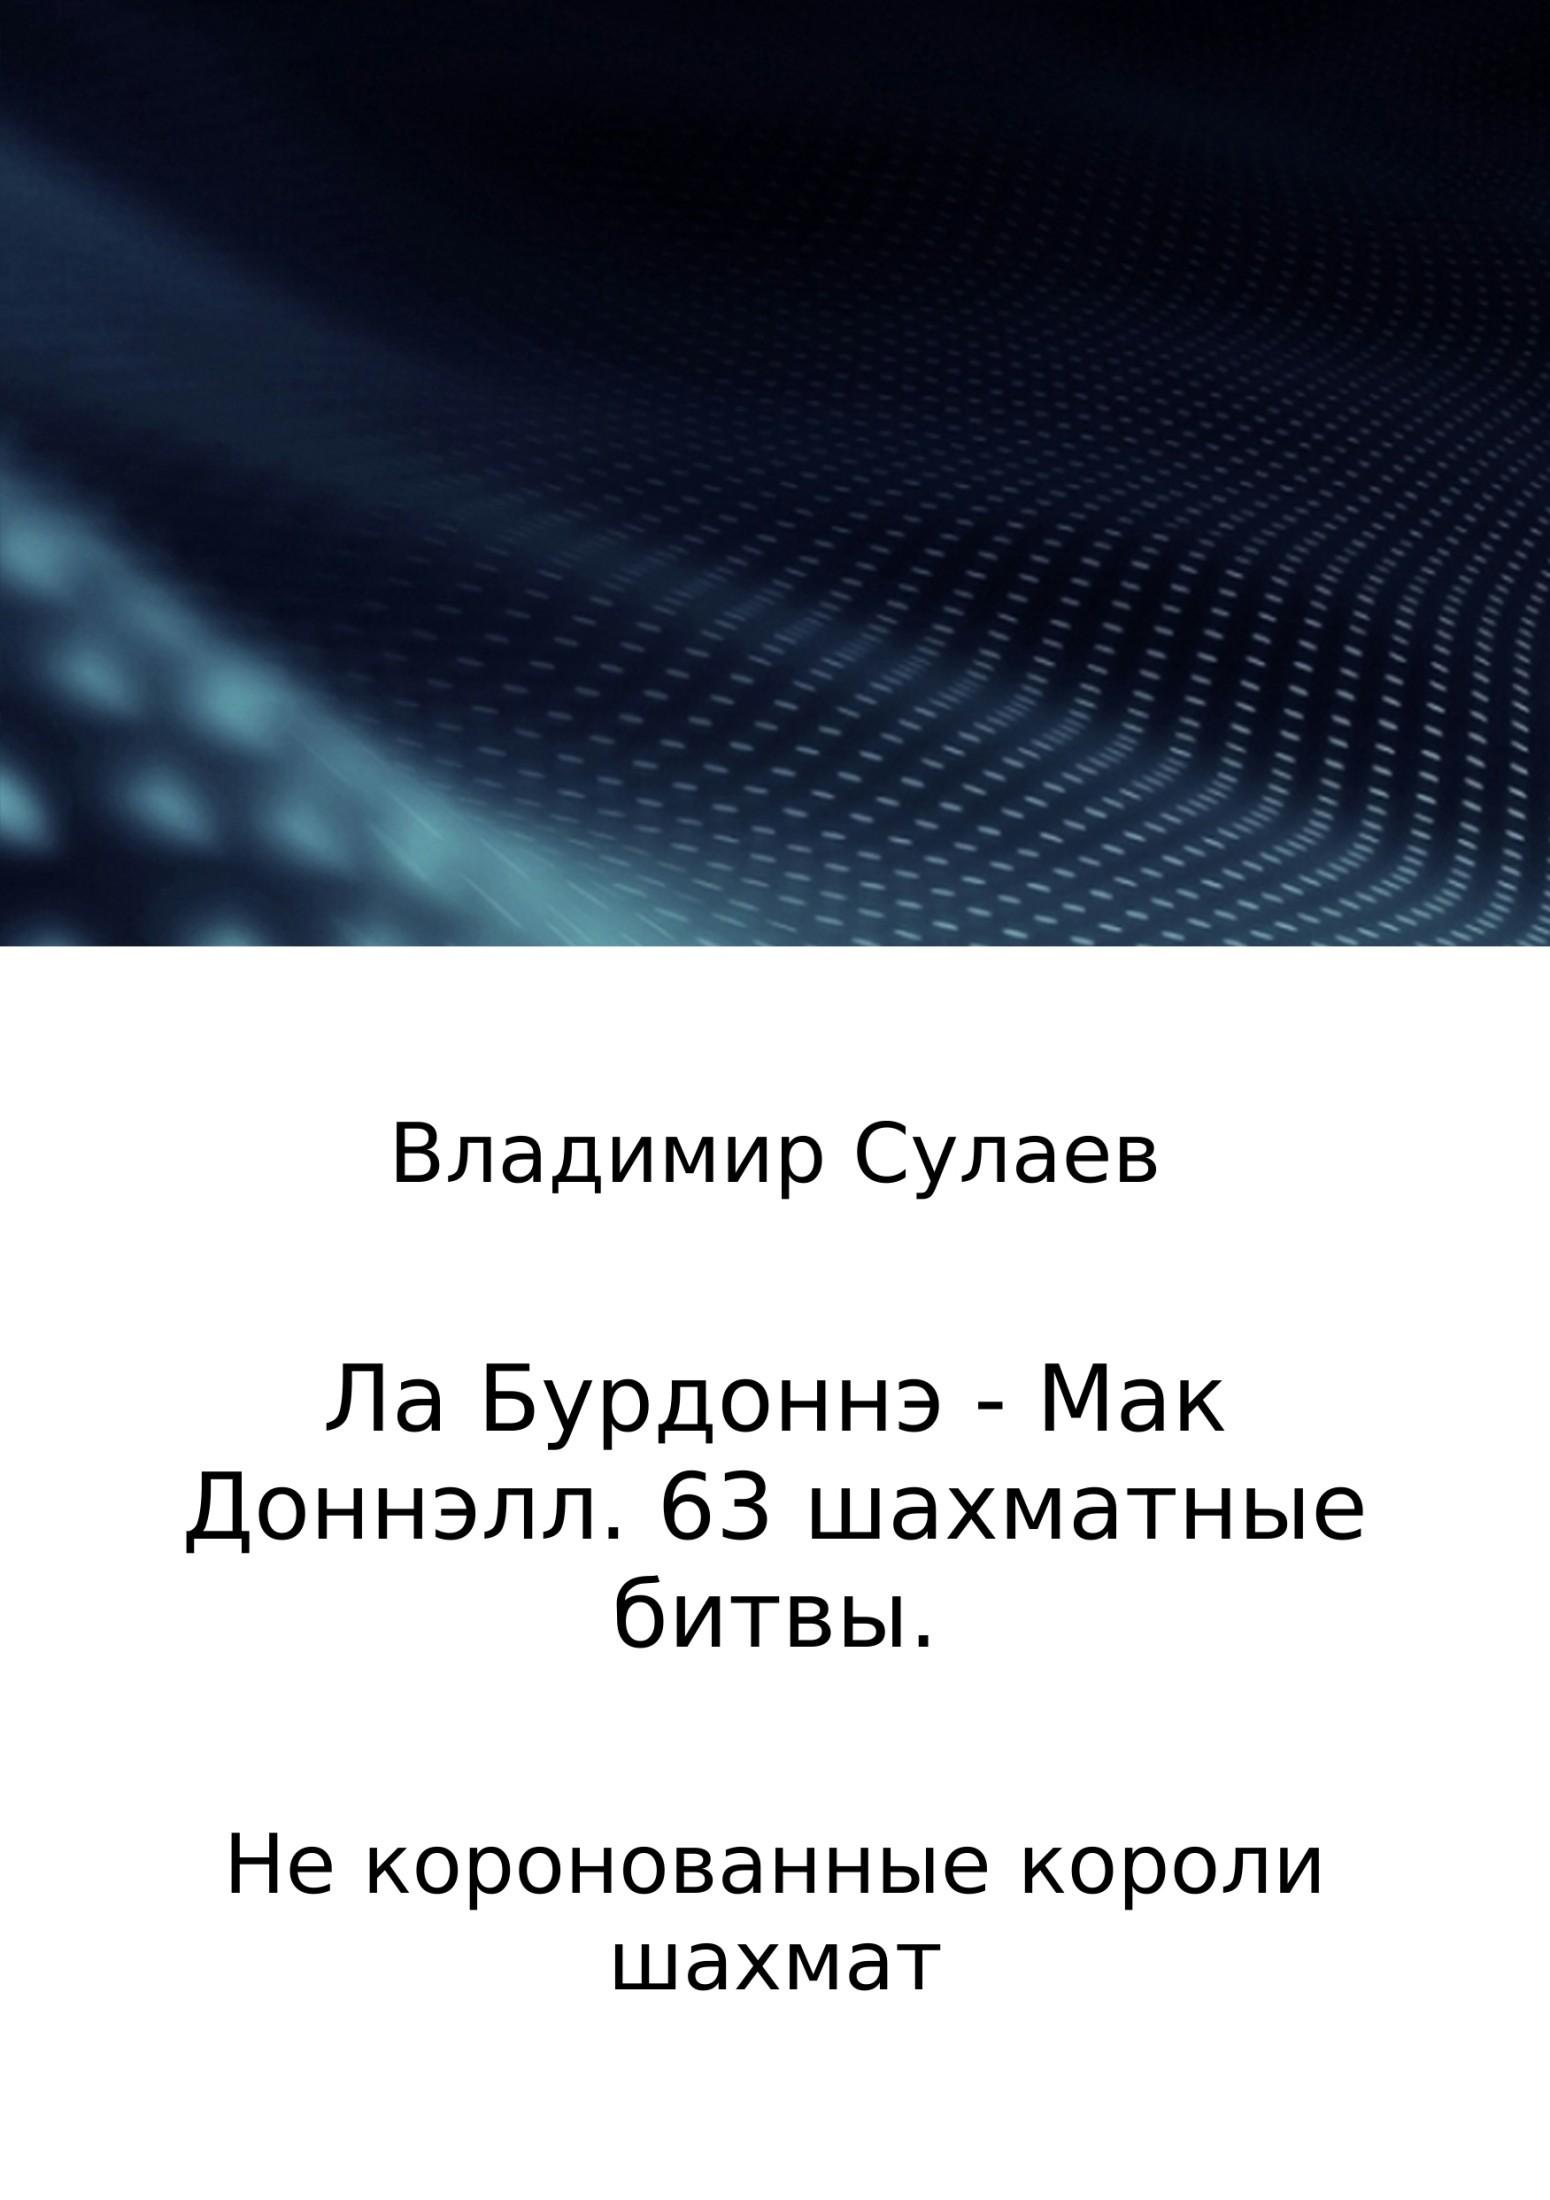 Владимир Валерьевич Сулаев Ла Бурдоннэ – Мак Доннэлл. 63 шахматные битвы владимир валерьевич сулаев диалог с